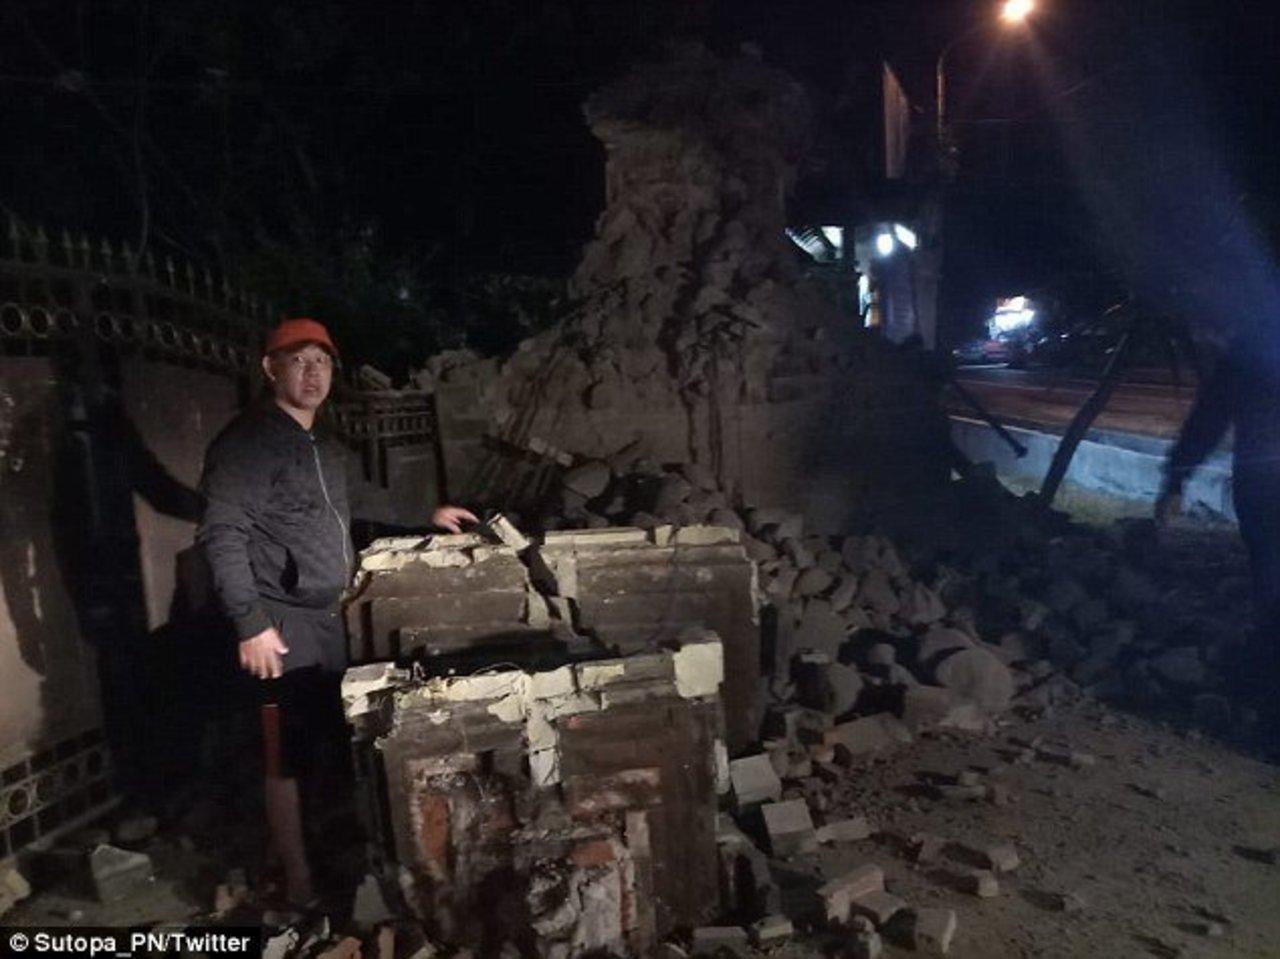 Un fuerte sismo sacude Papúa Nueva Guinea